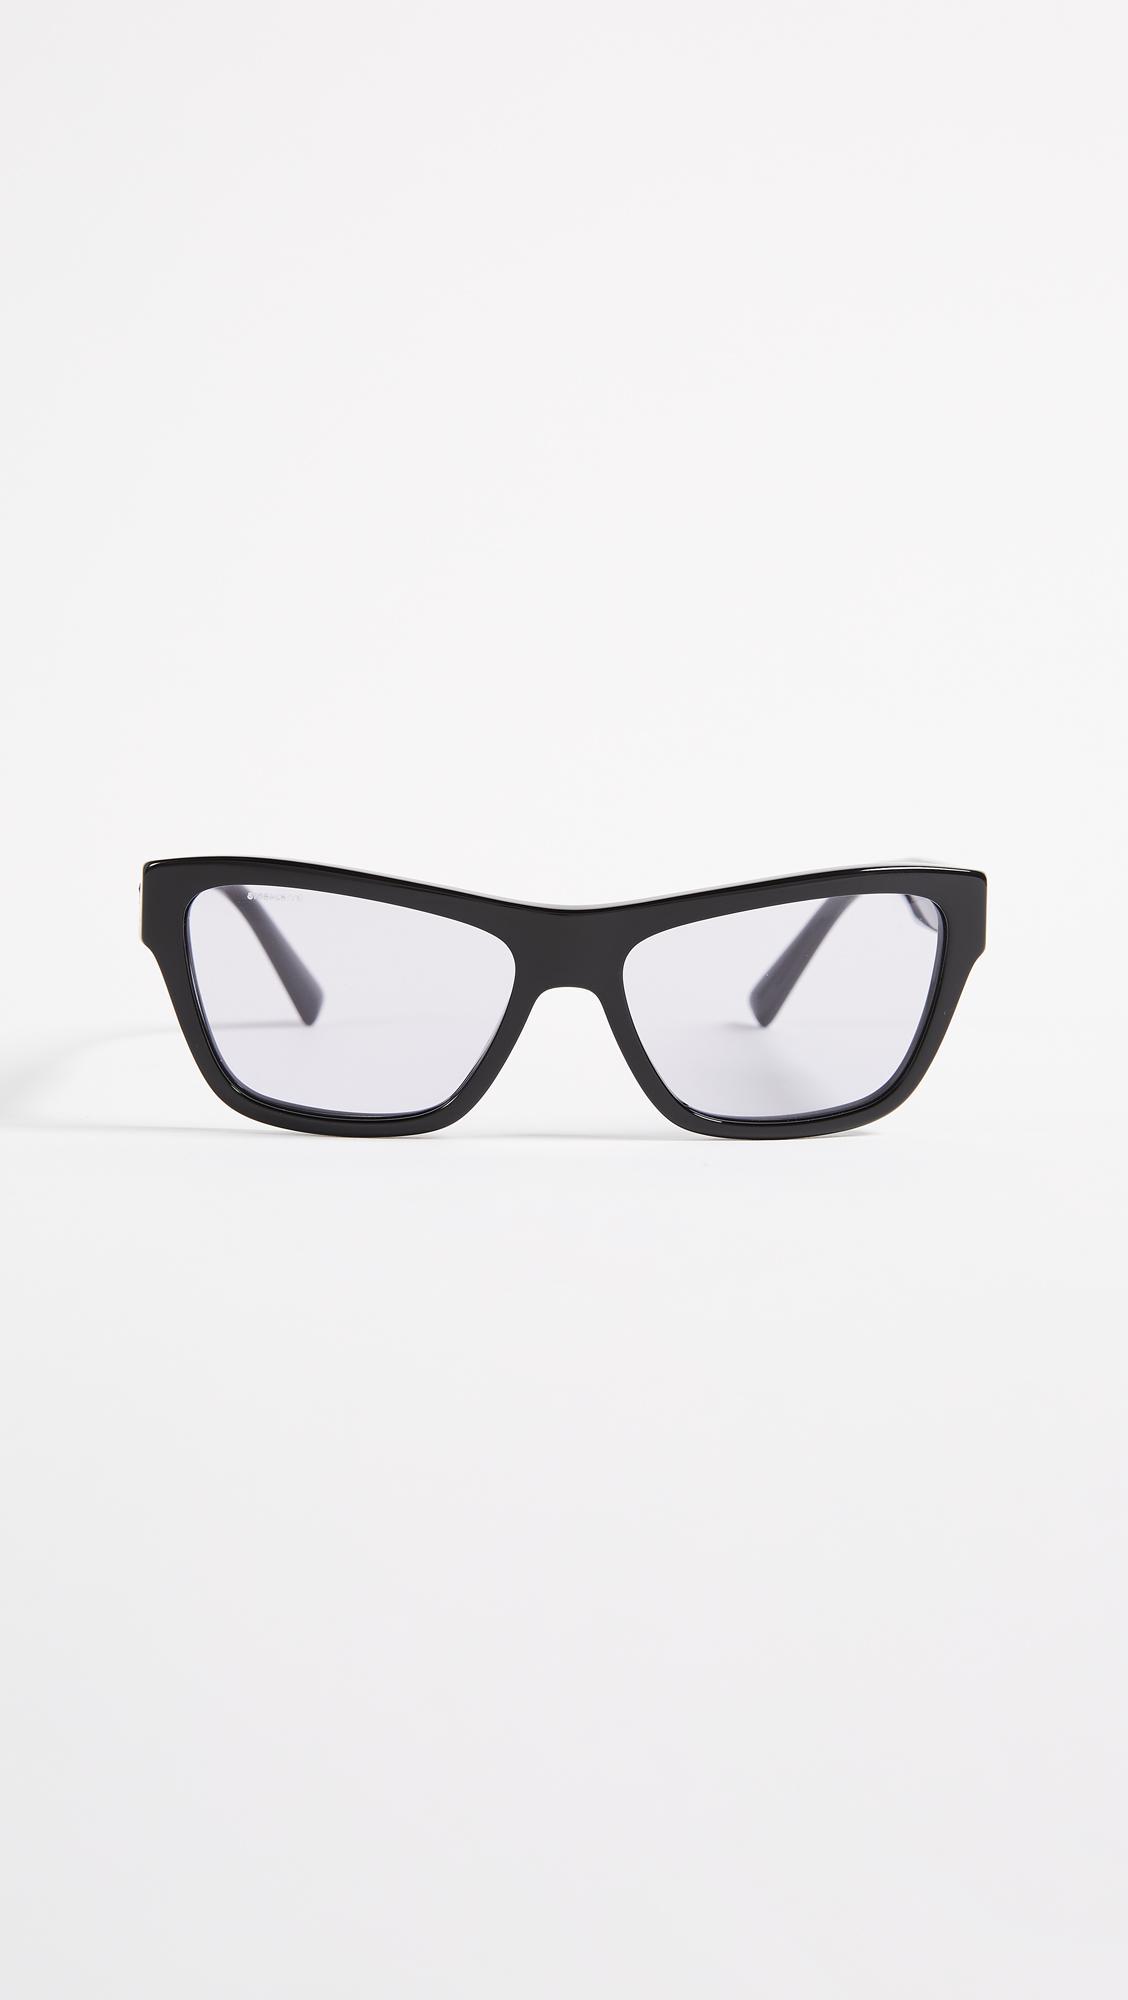 a83ee42e3132 Versace Rock Square Sunglasses in Black - Lyst